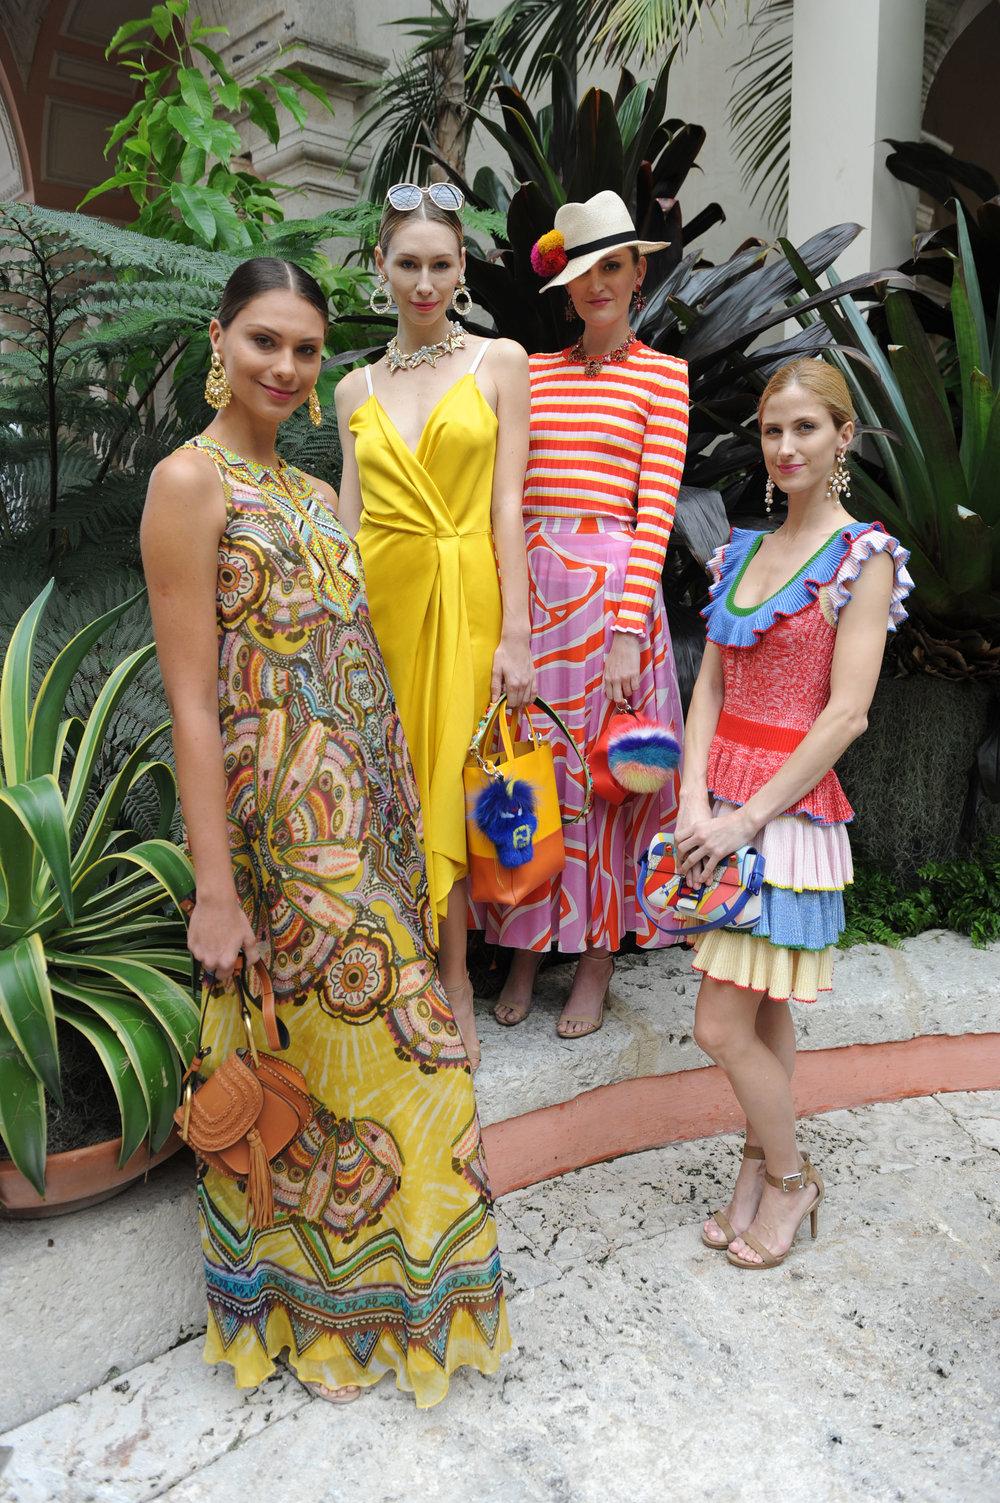 Neiman Marcus Models.jpg